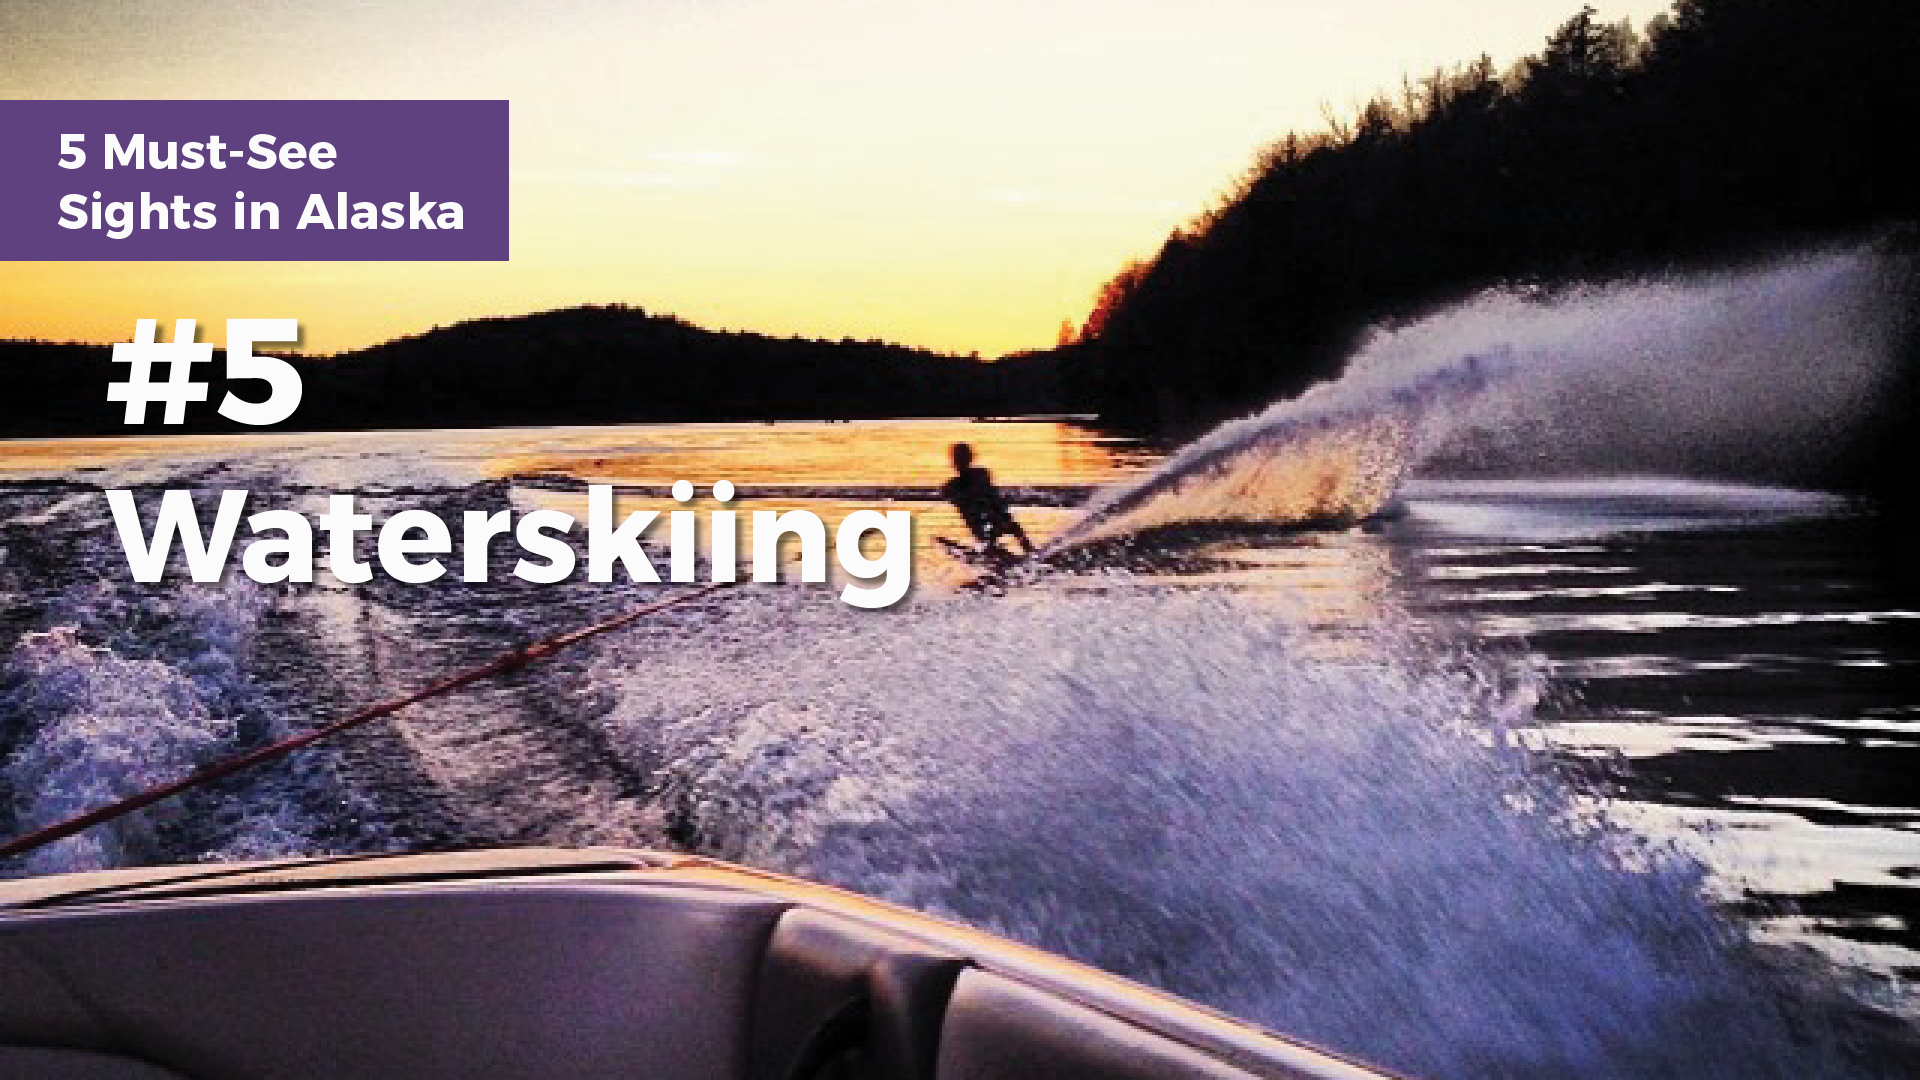 5-must-see-sights-in-alaska-waterskiing-fairbanks-interior